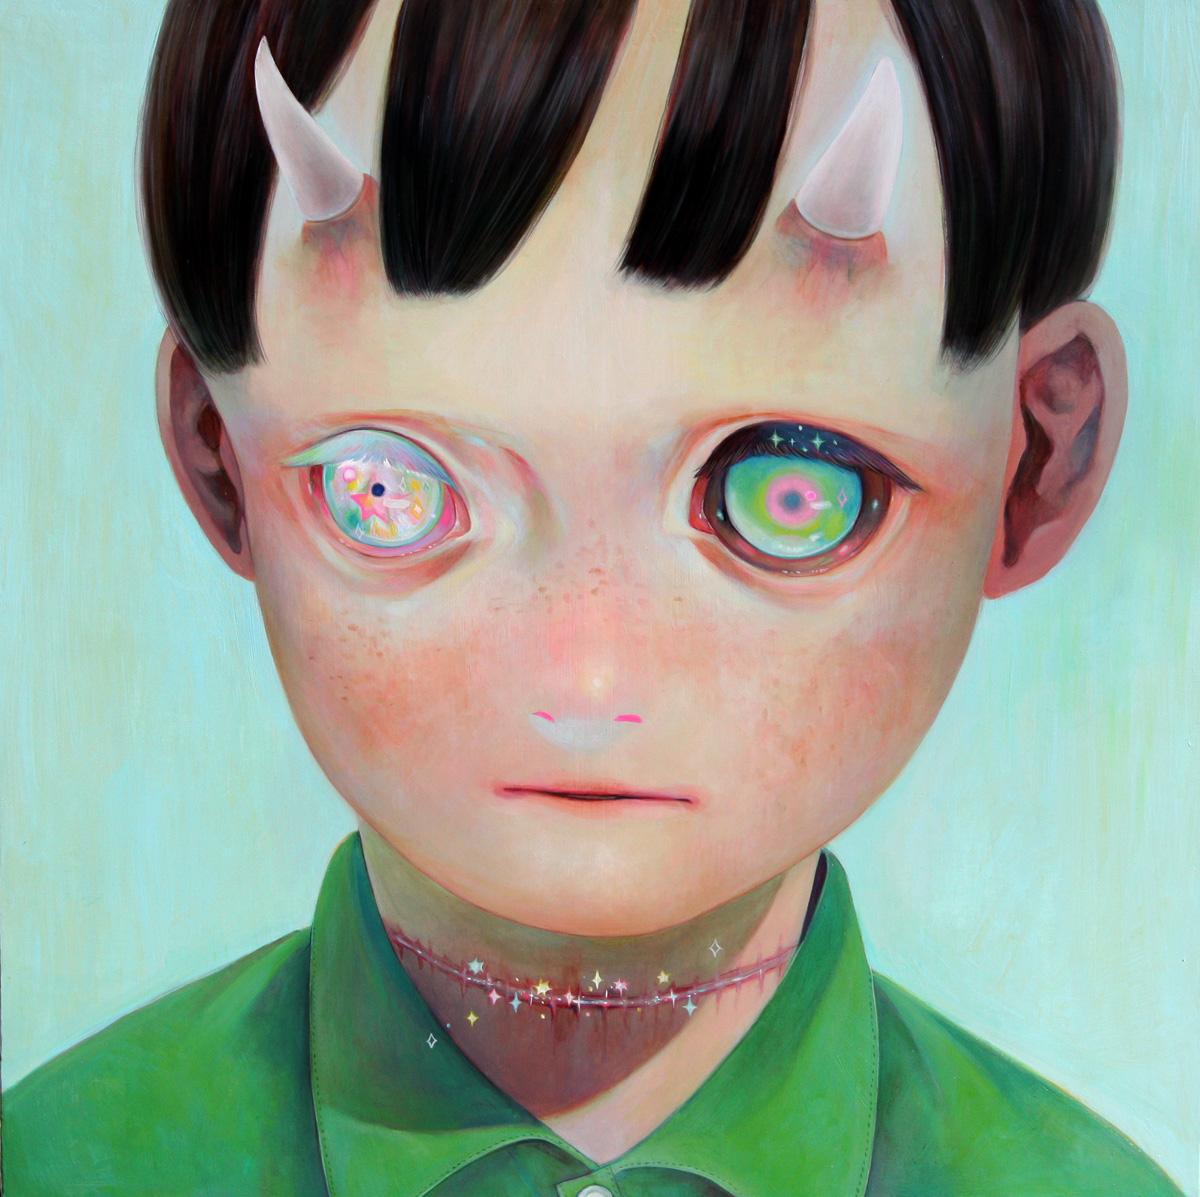 Hikari Shimoda 'Whereabouts of God #1' (oil on canvas, 29 x 29 inches, 2012).jpg